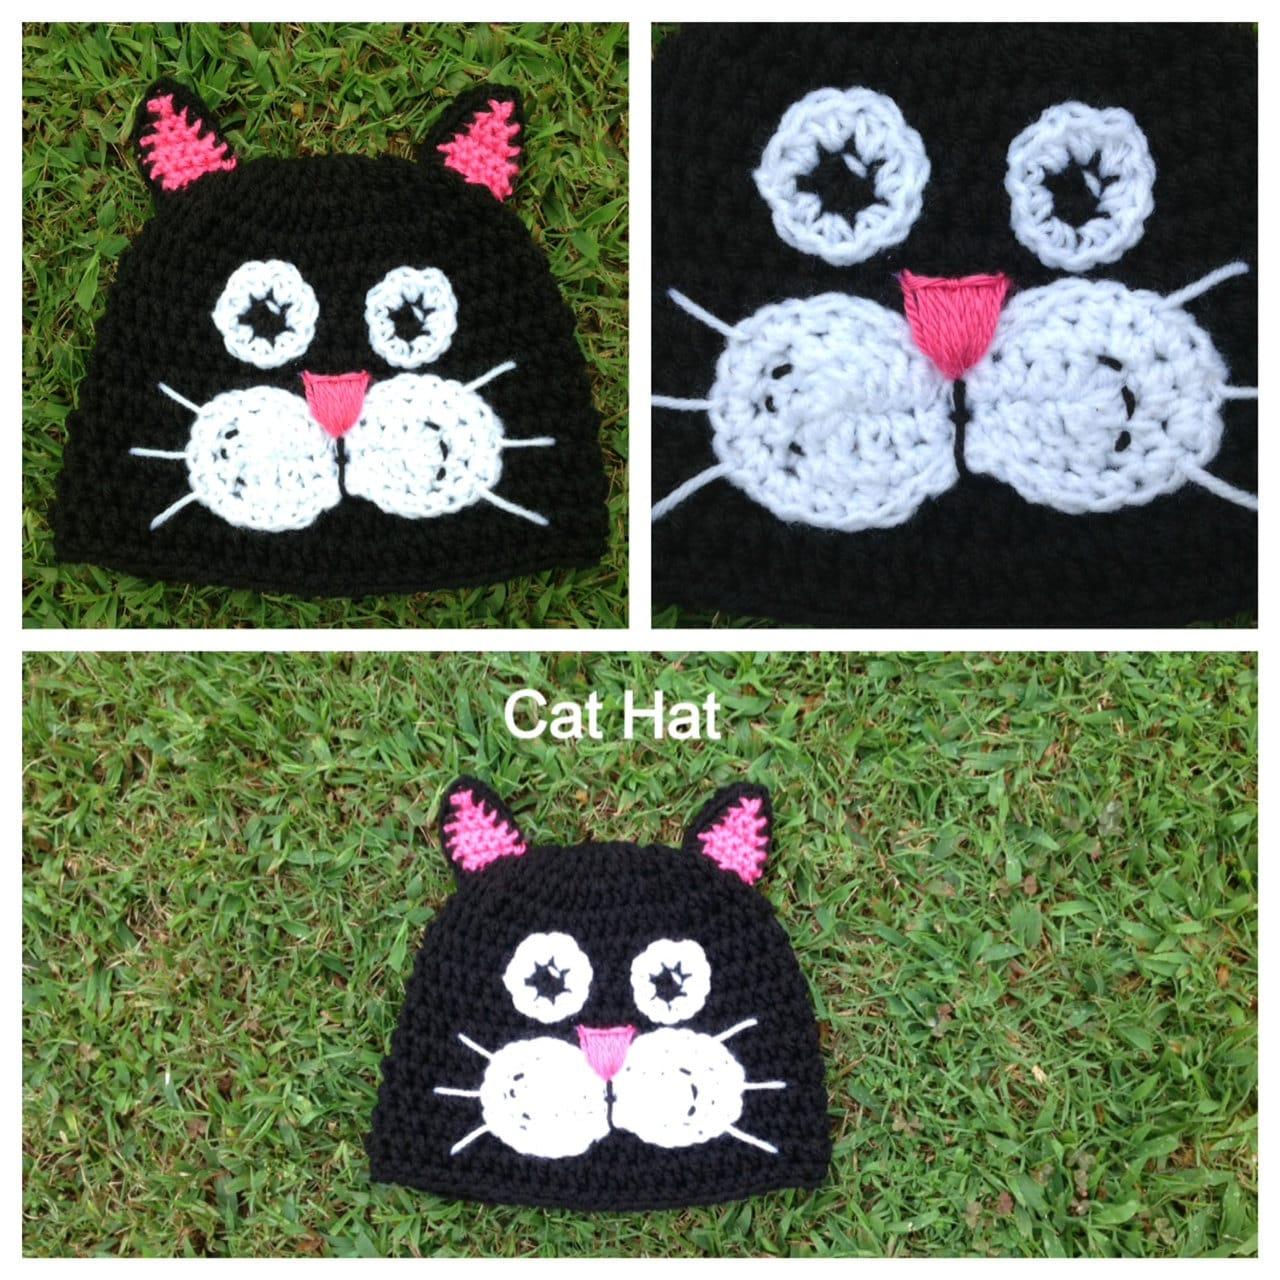 Crochet Cat Hat Pattern . Newborn Adult Sizes by KraftyShack